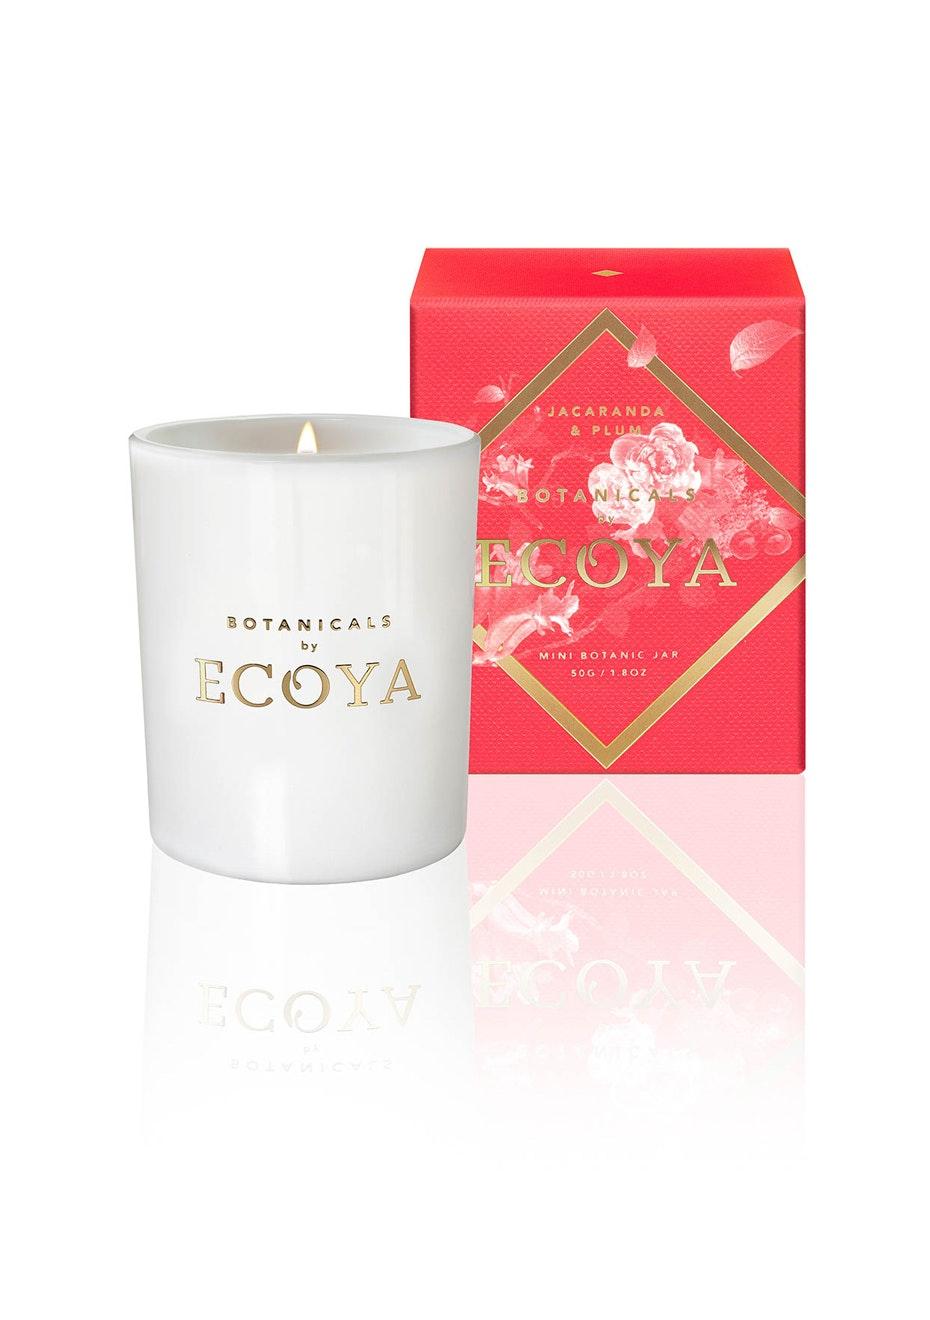 Ecoya - Mini Botanic - Jacaranda & Plum